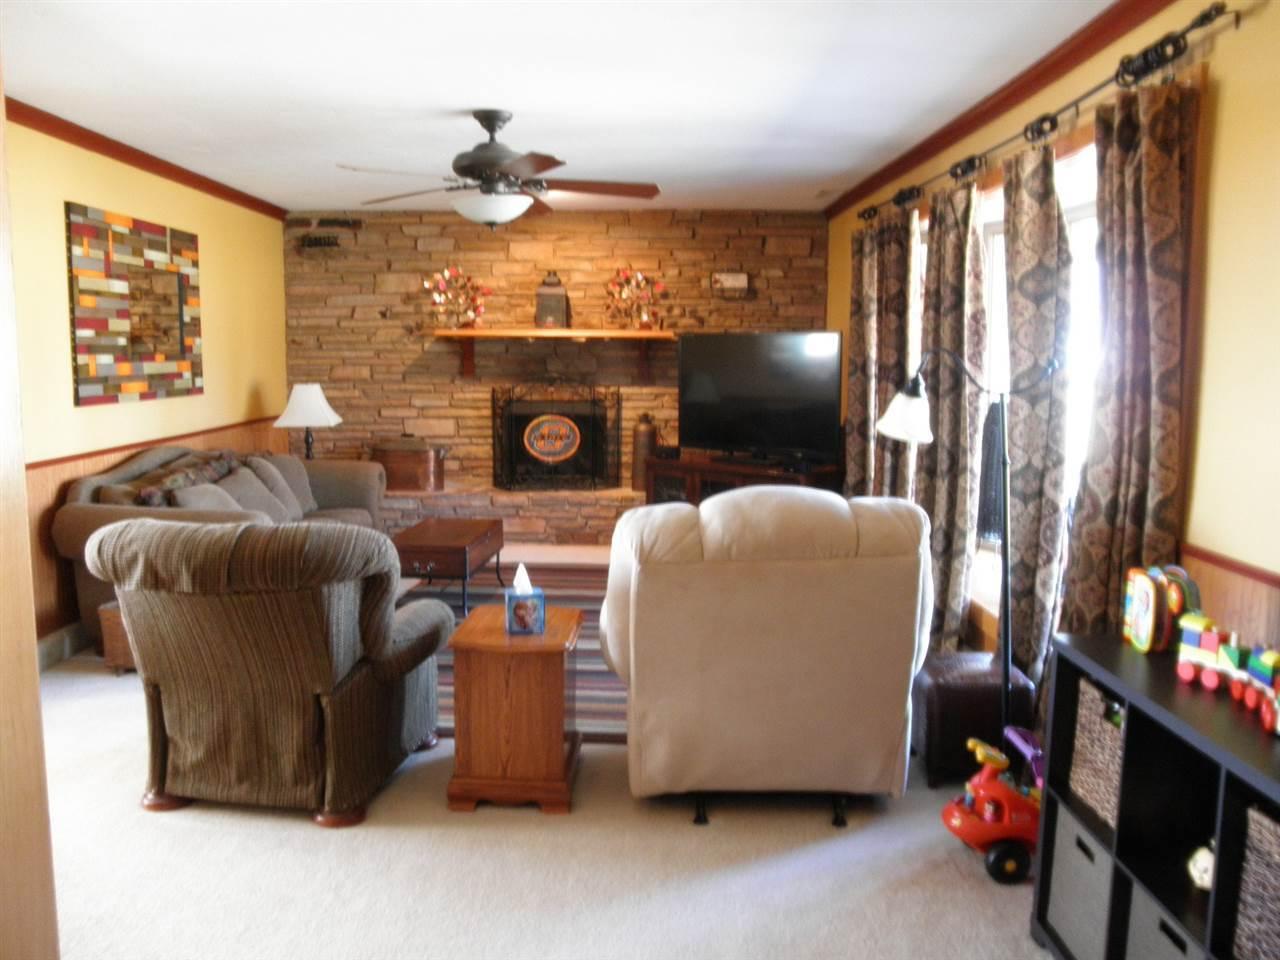 Sold Intraoffice W/MLS | 7038 River Ridge Drive  Ponca City, OK 74604 3